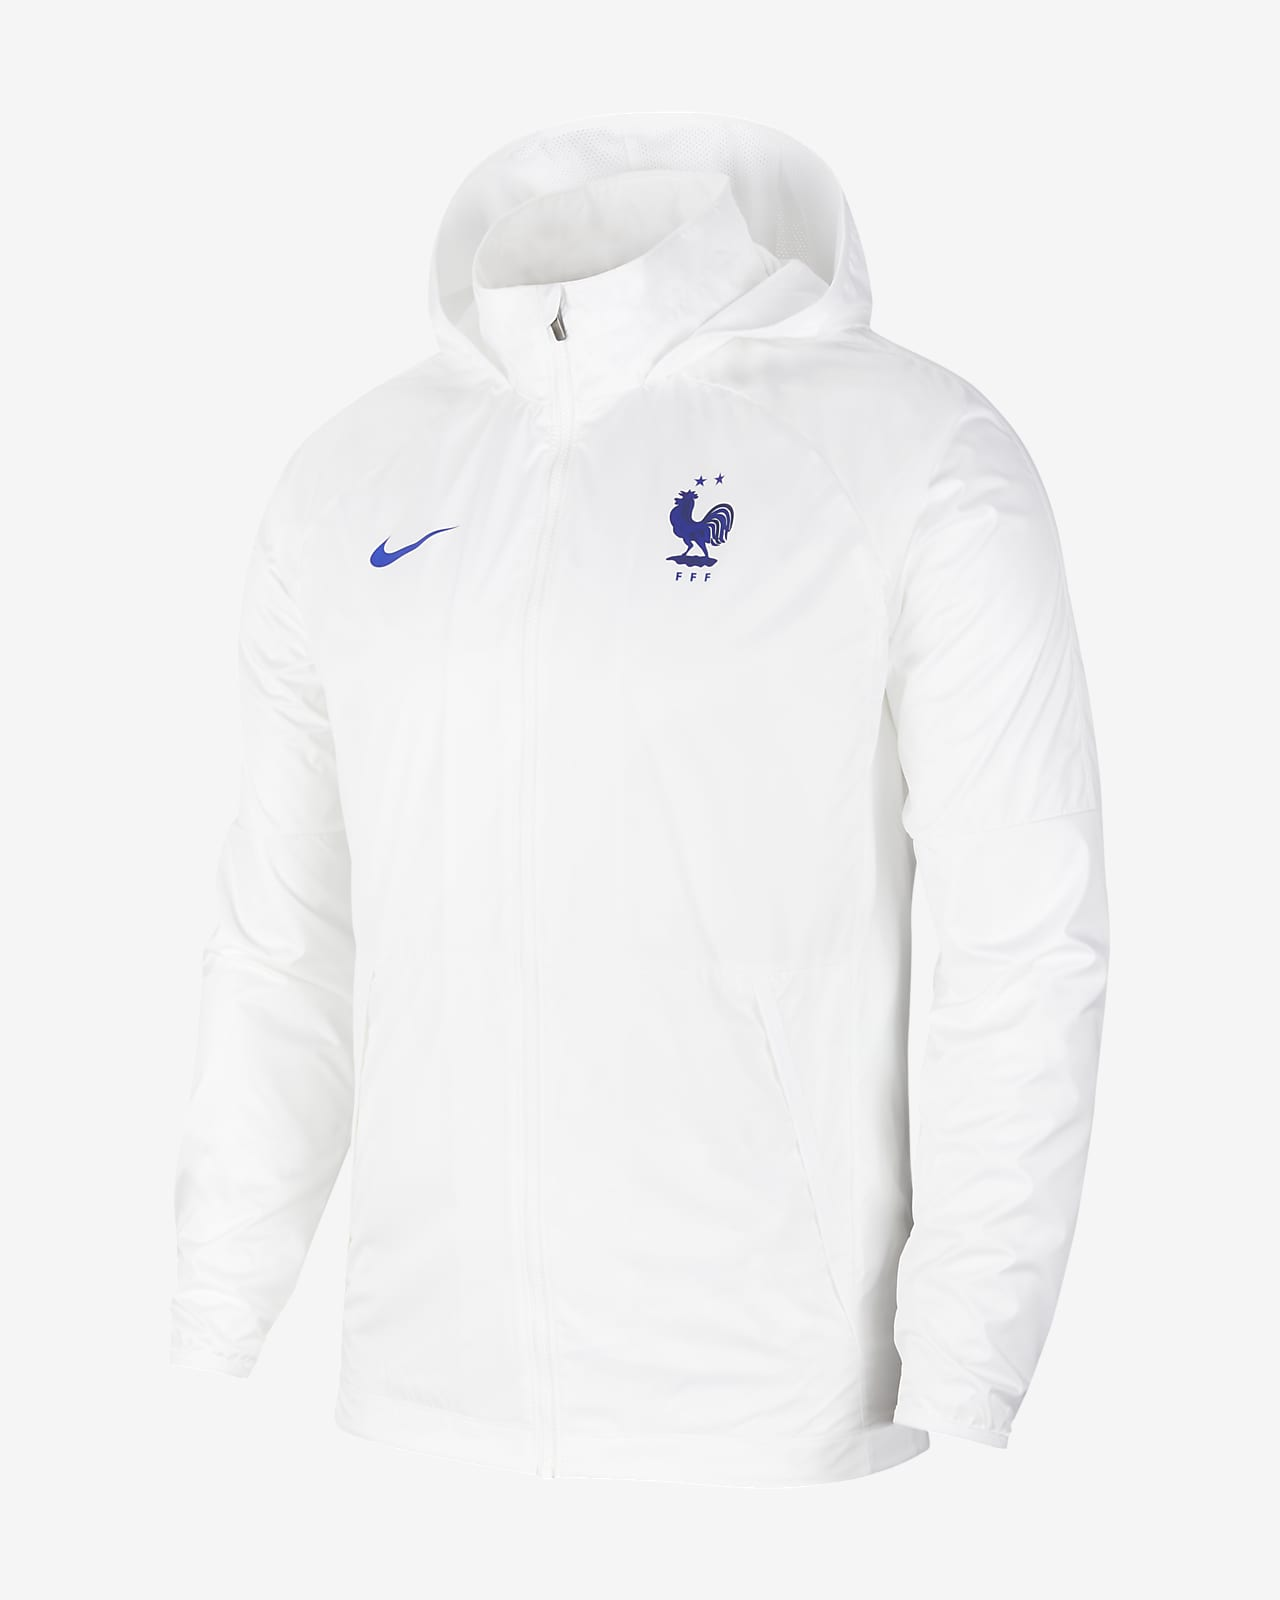 FFF Men's Football Jacket